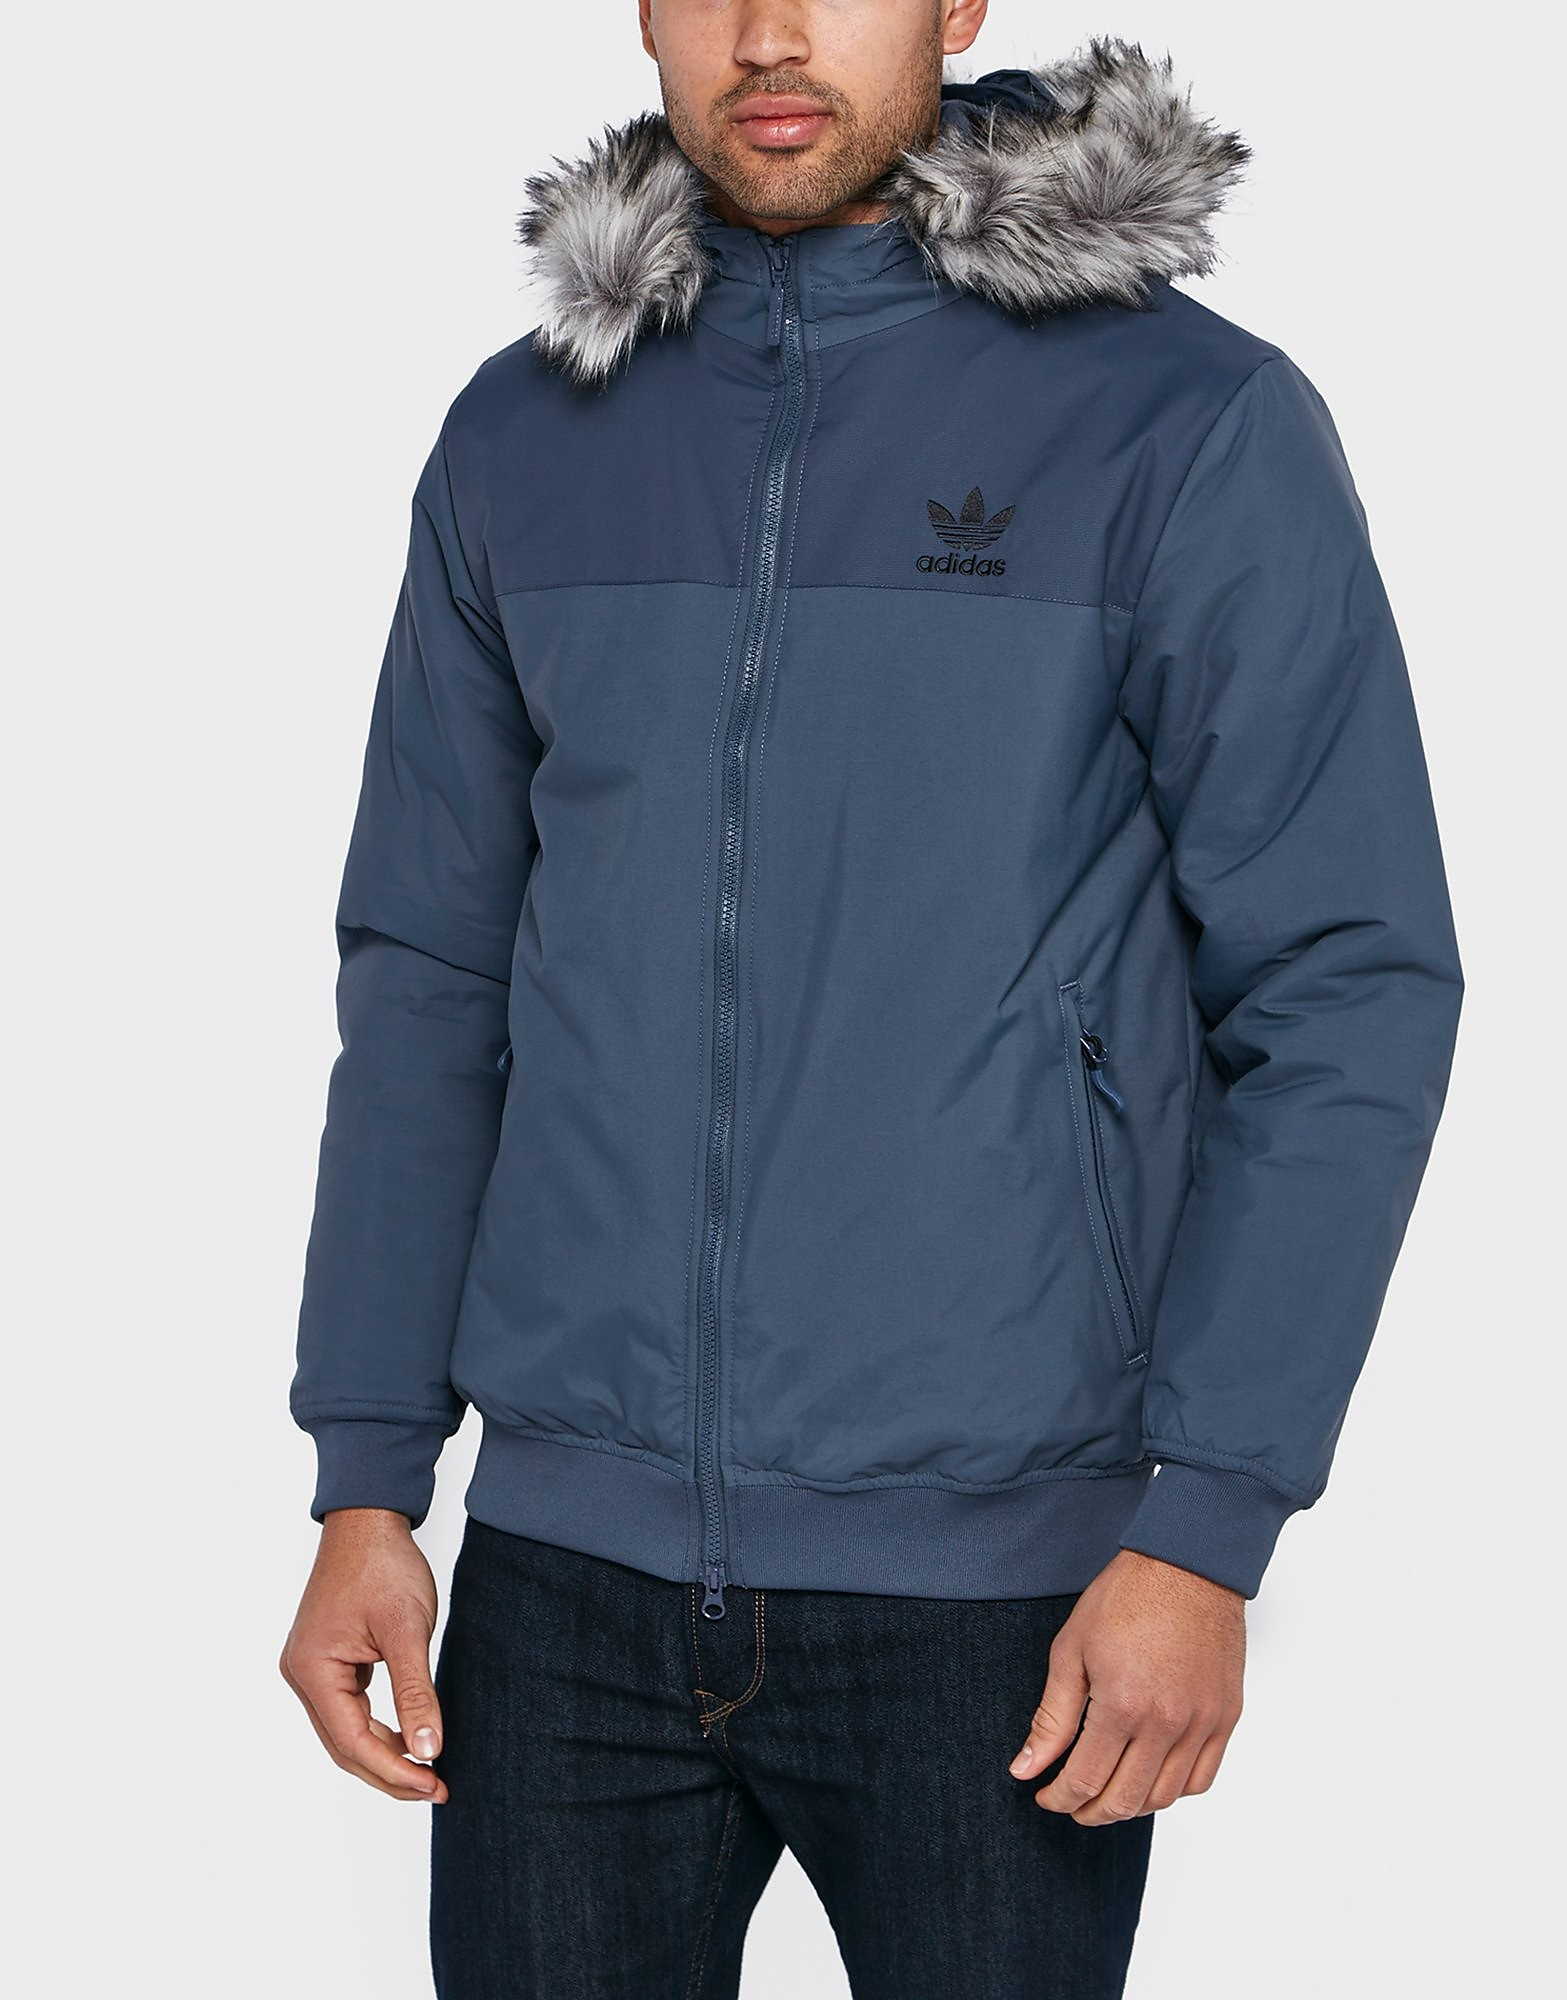 adidas Originals Trefoil Fur Parka